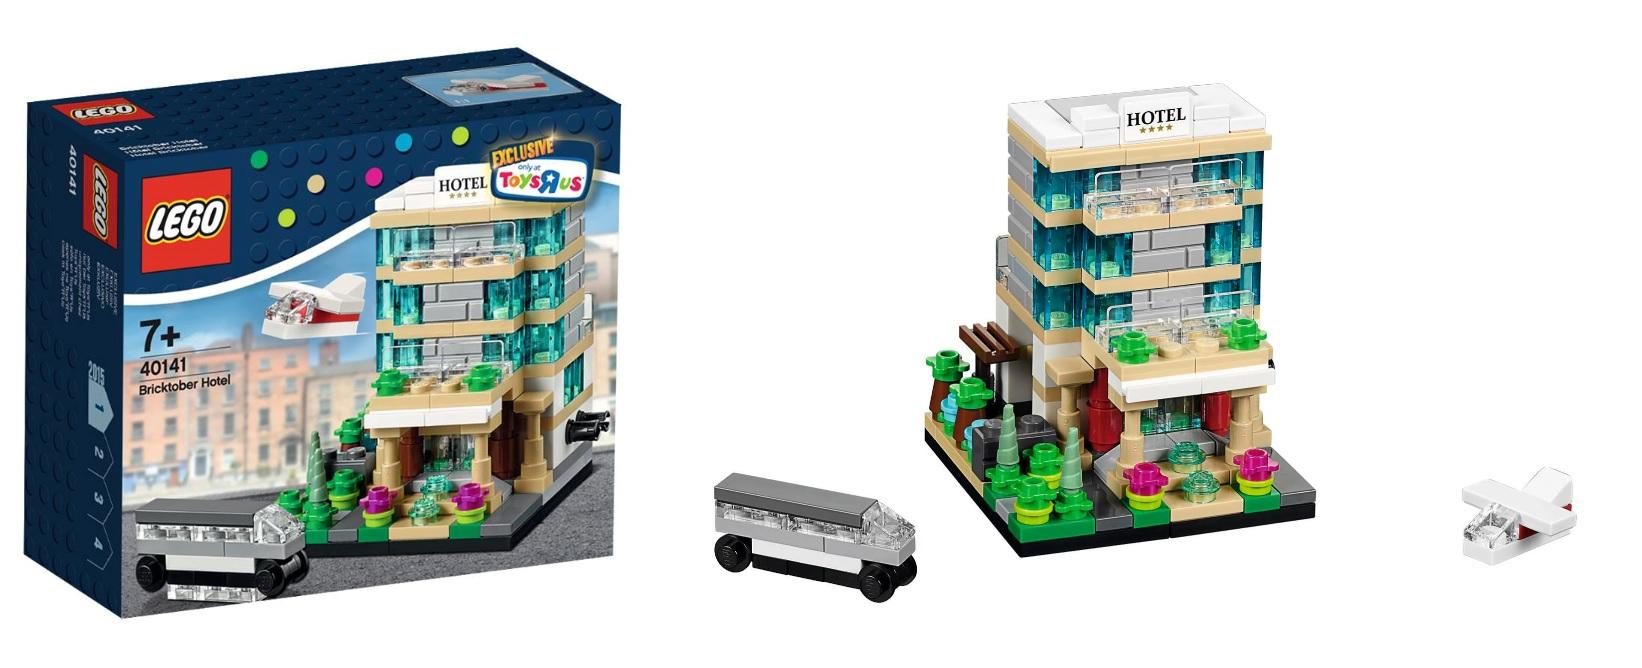 lego 40141 bricktober hotel toysrus 2015 promo set toysnbricks